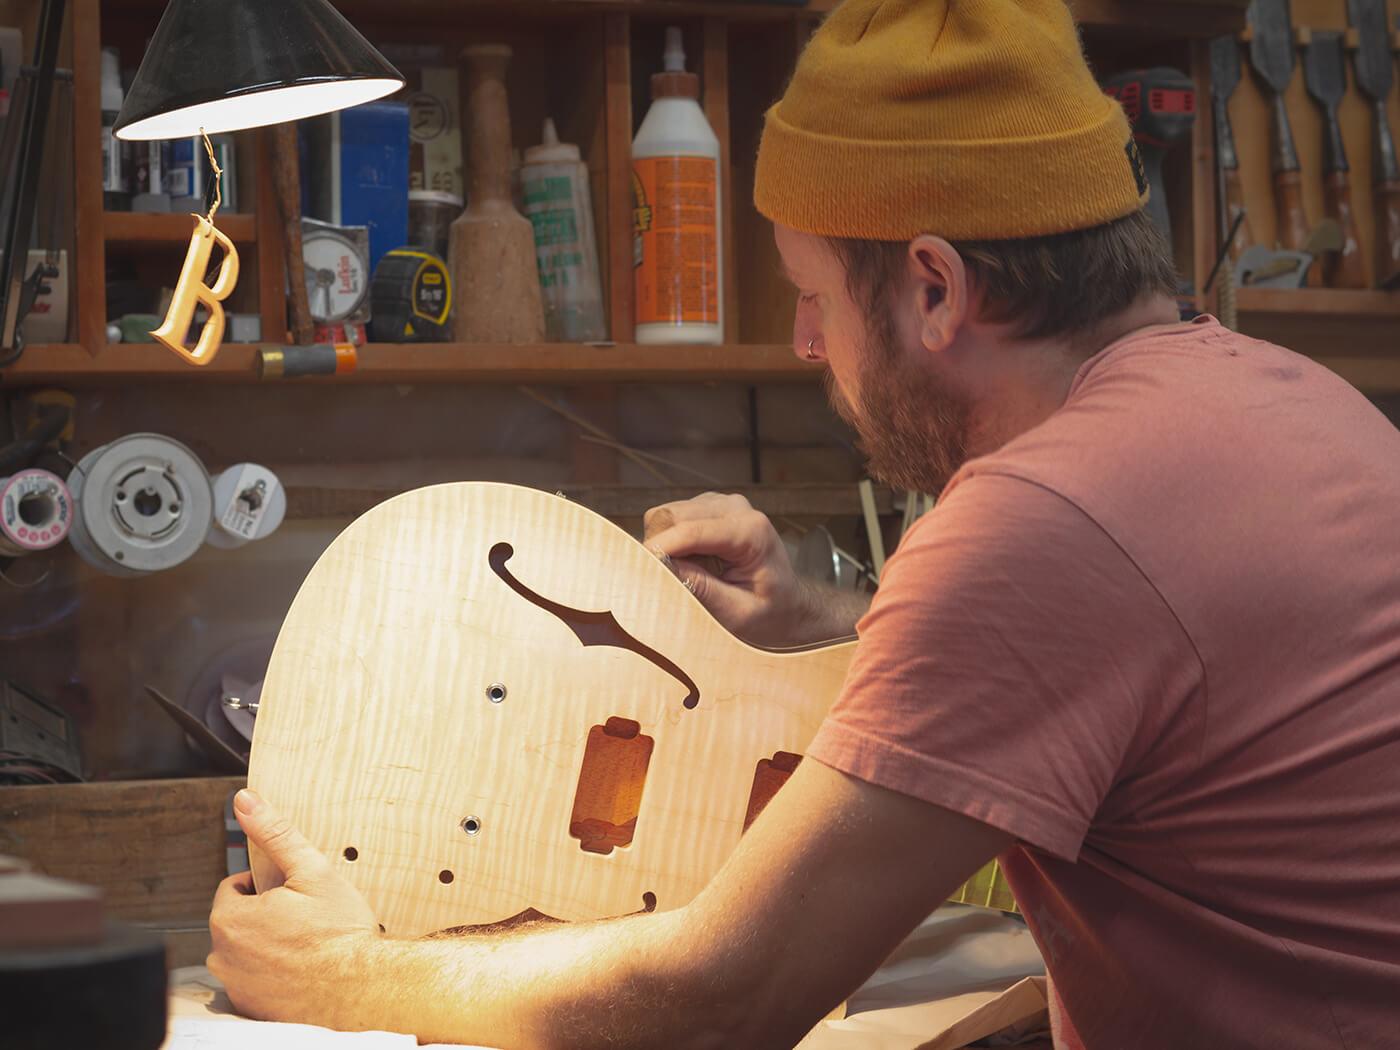 Bartlett Guitars